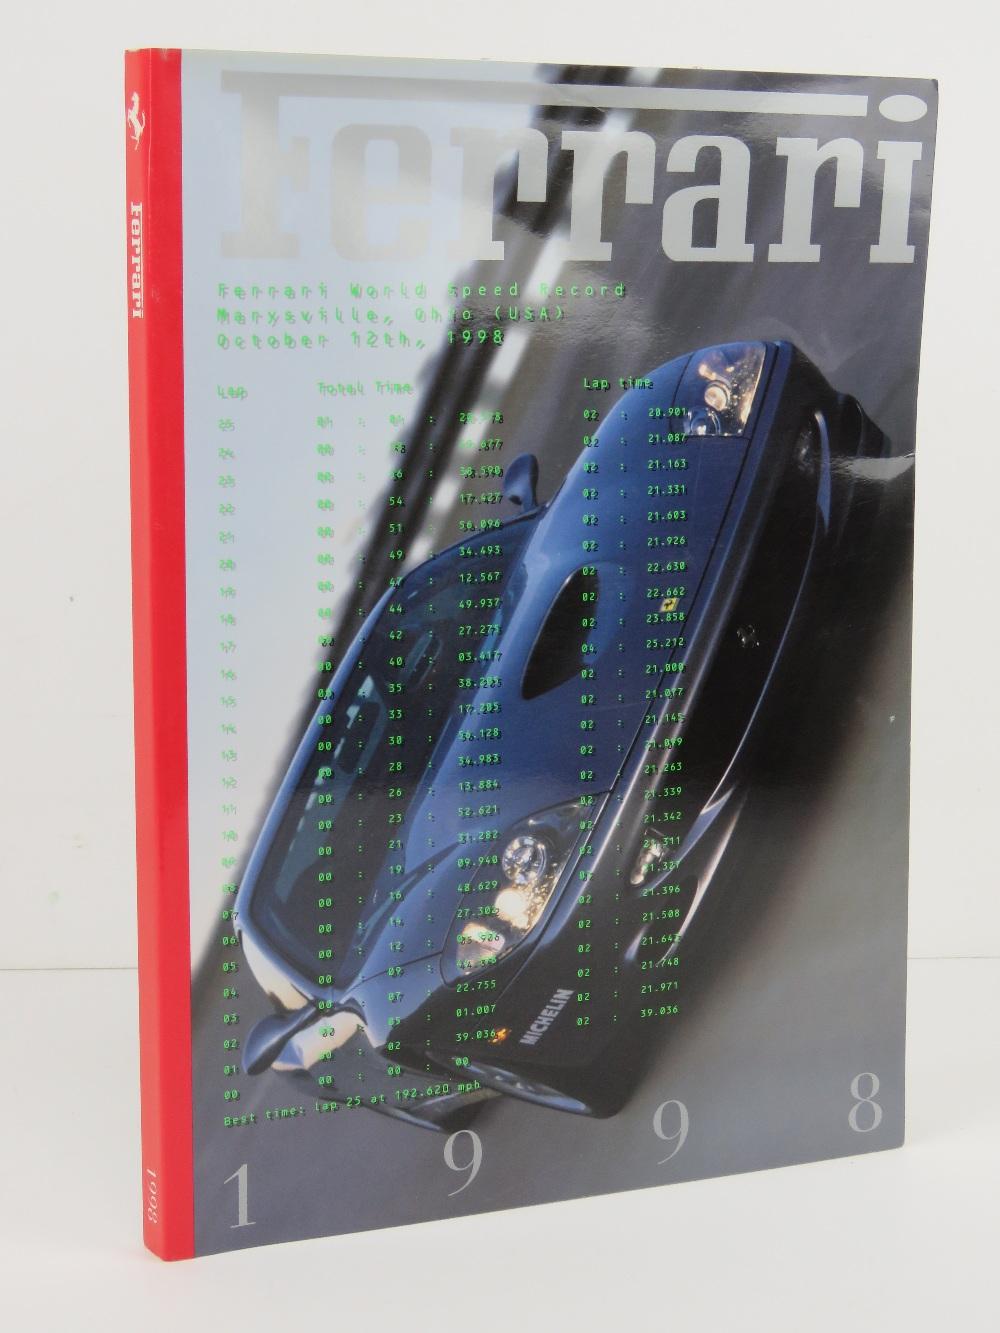 Ferrari Yearbook 1998. Italian edition. Softback book.